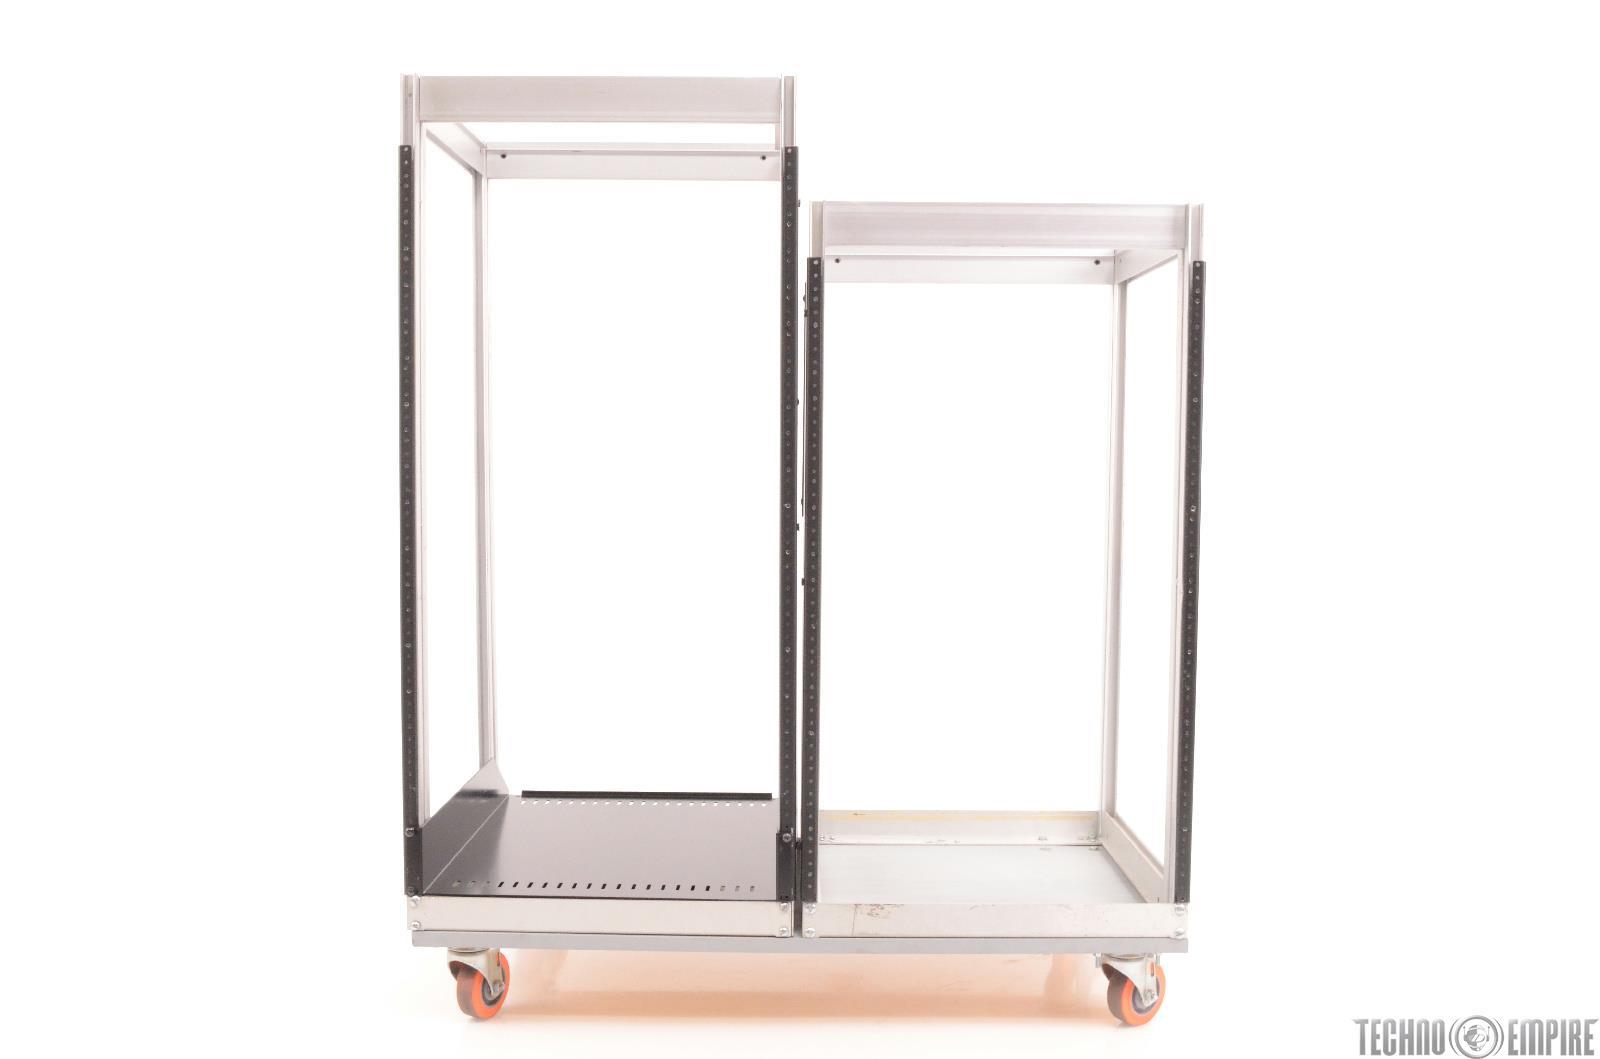 55 Space 55U Aluminum Dual Server Rack Studio Case w/ Casters #24942